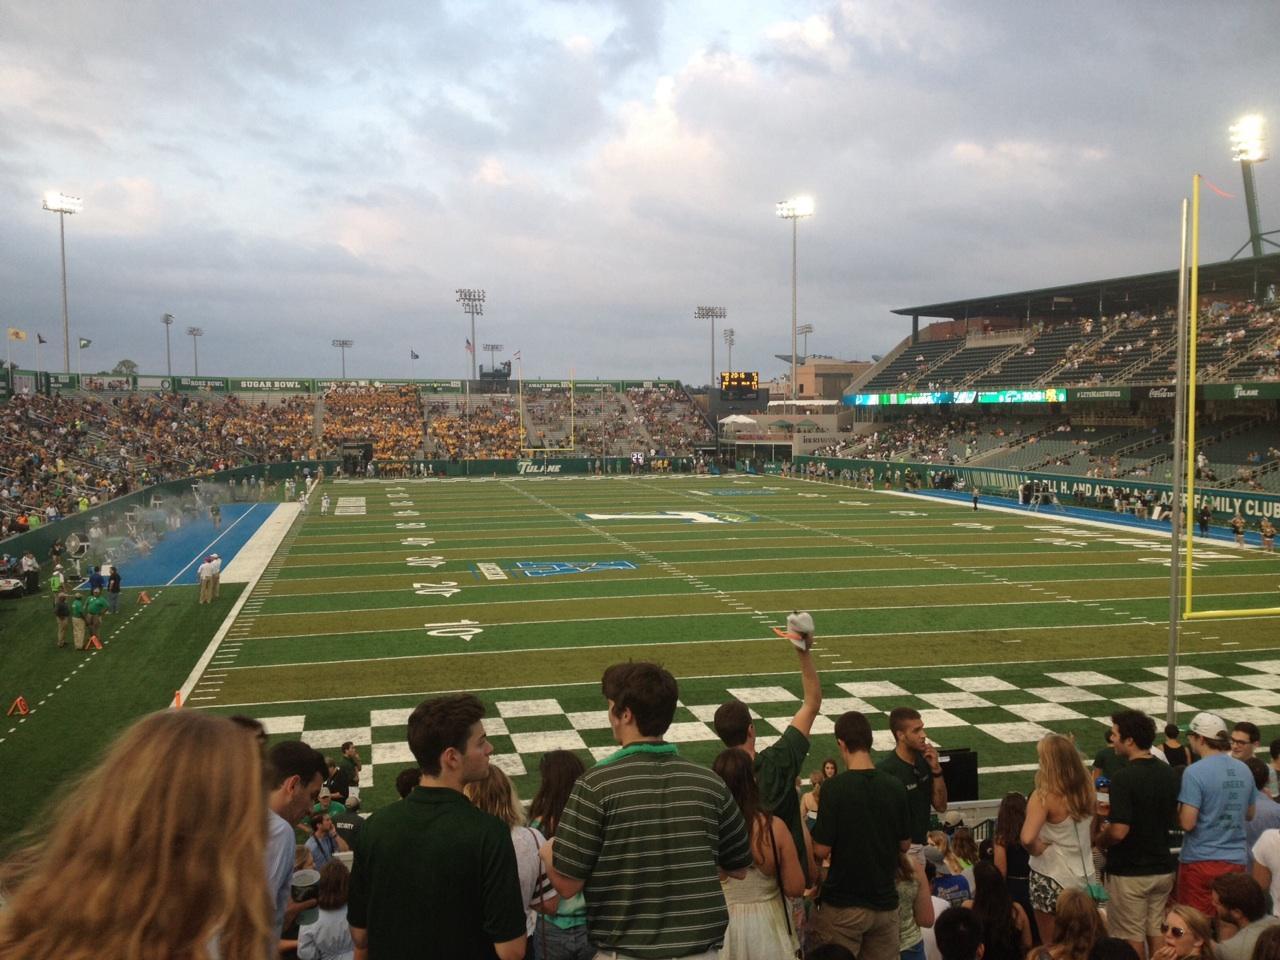 Yulman Stadium Section 127 Row X Seat 15